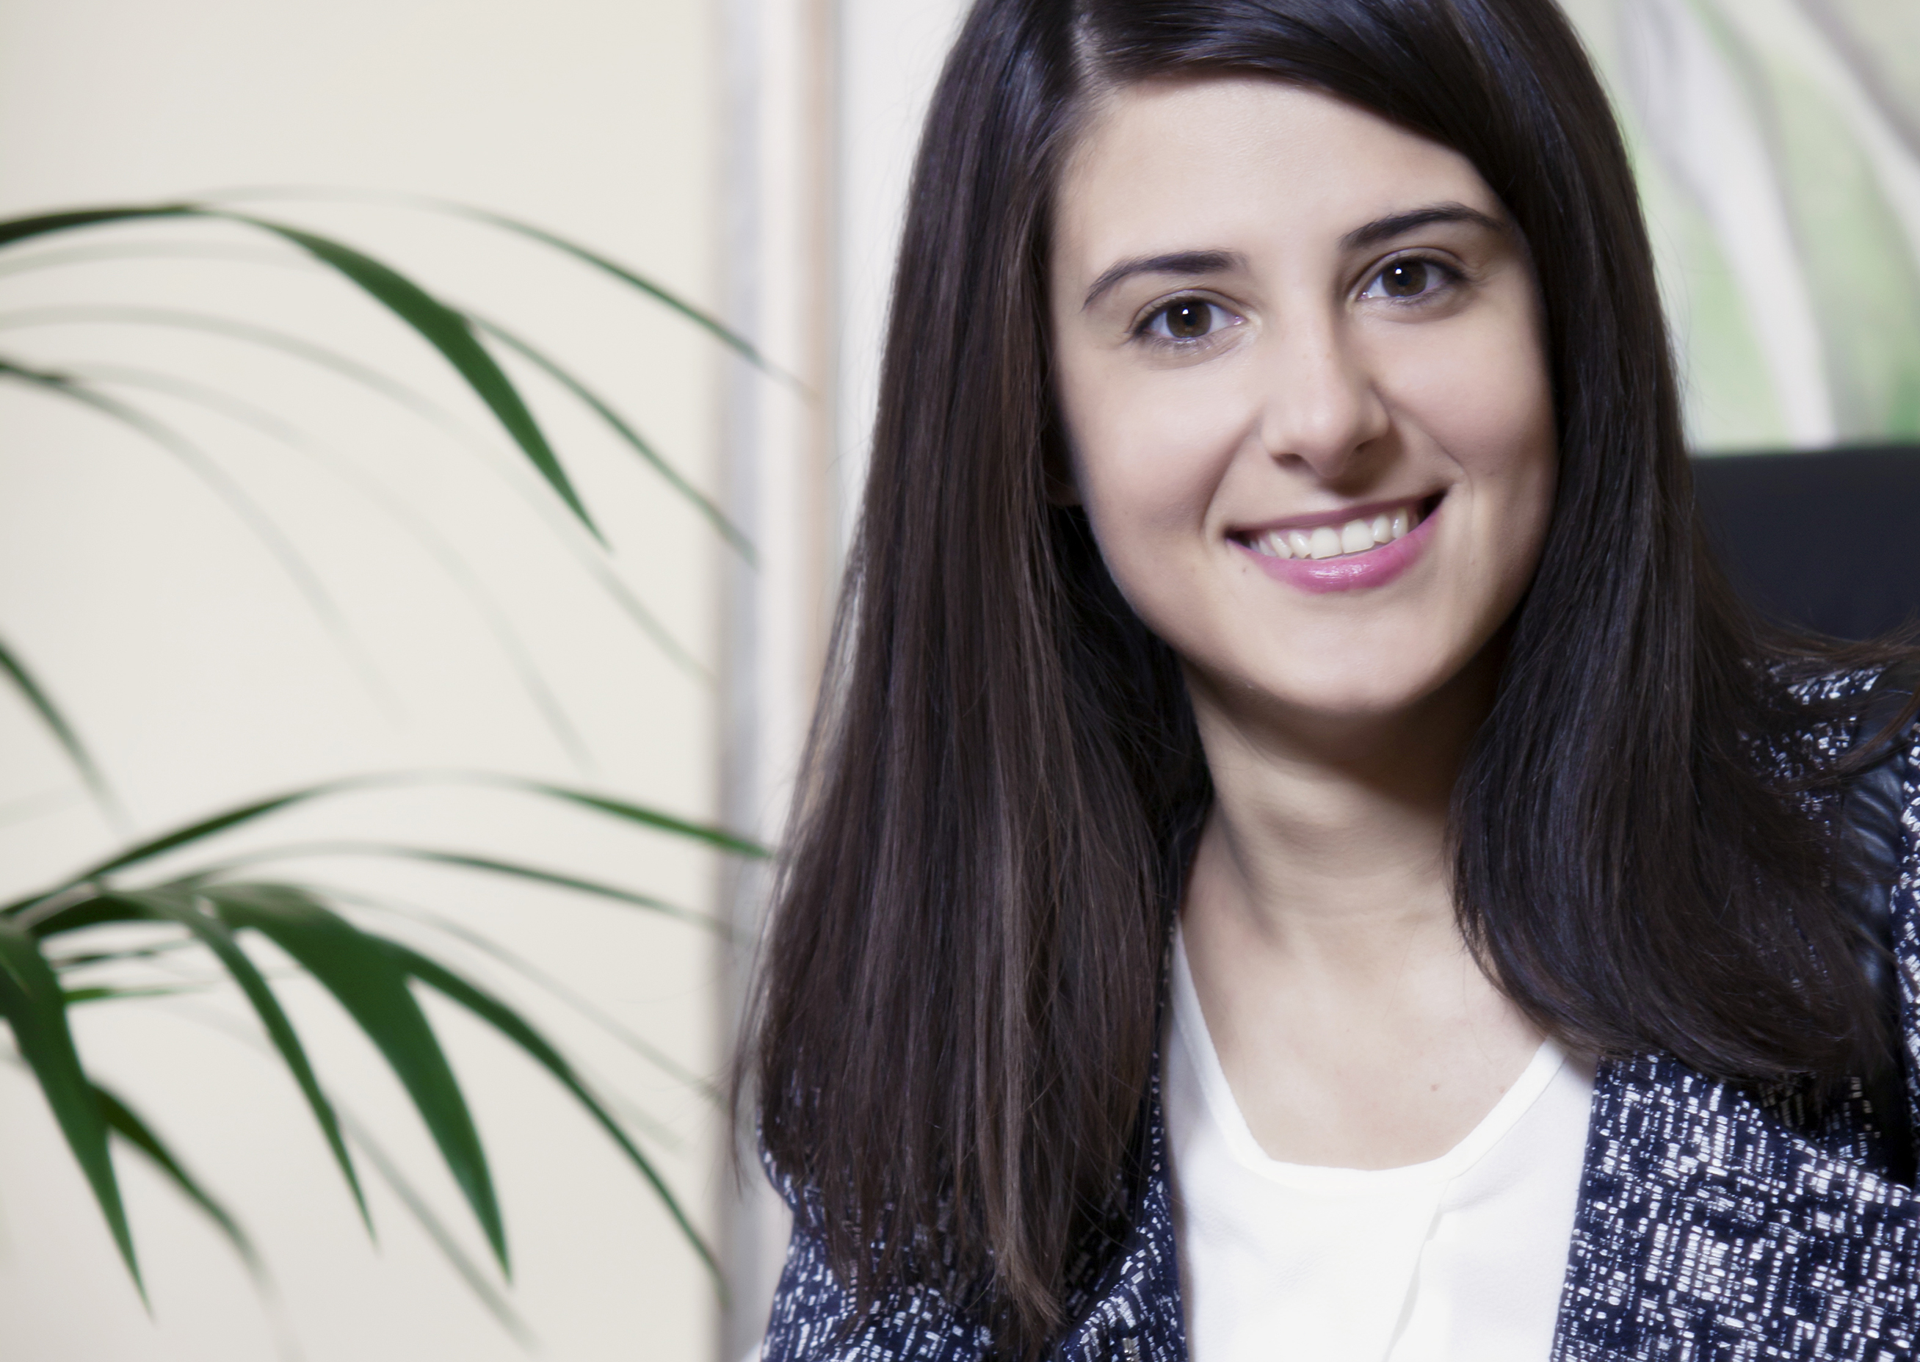 Dott.ssa Chiara Durante